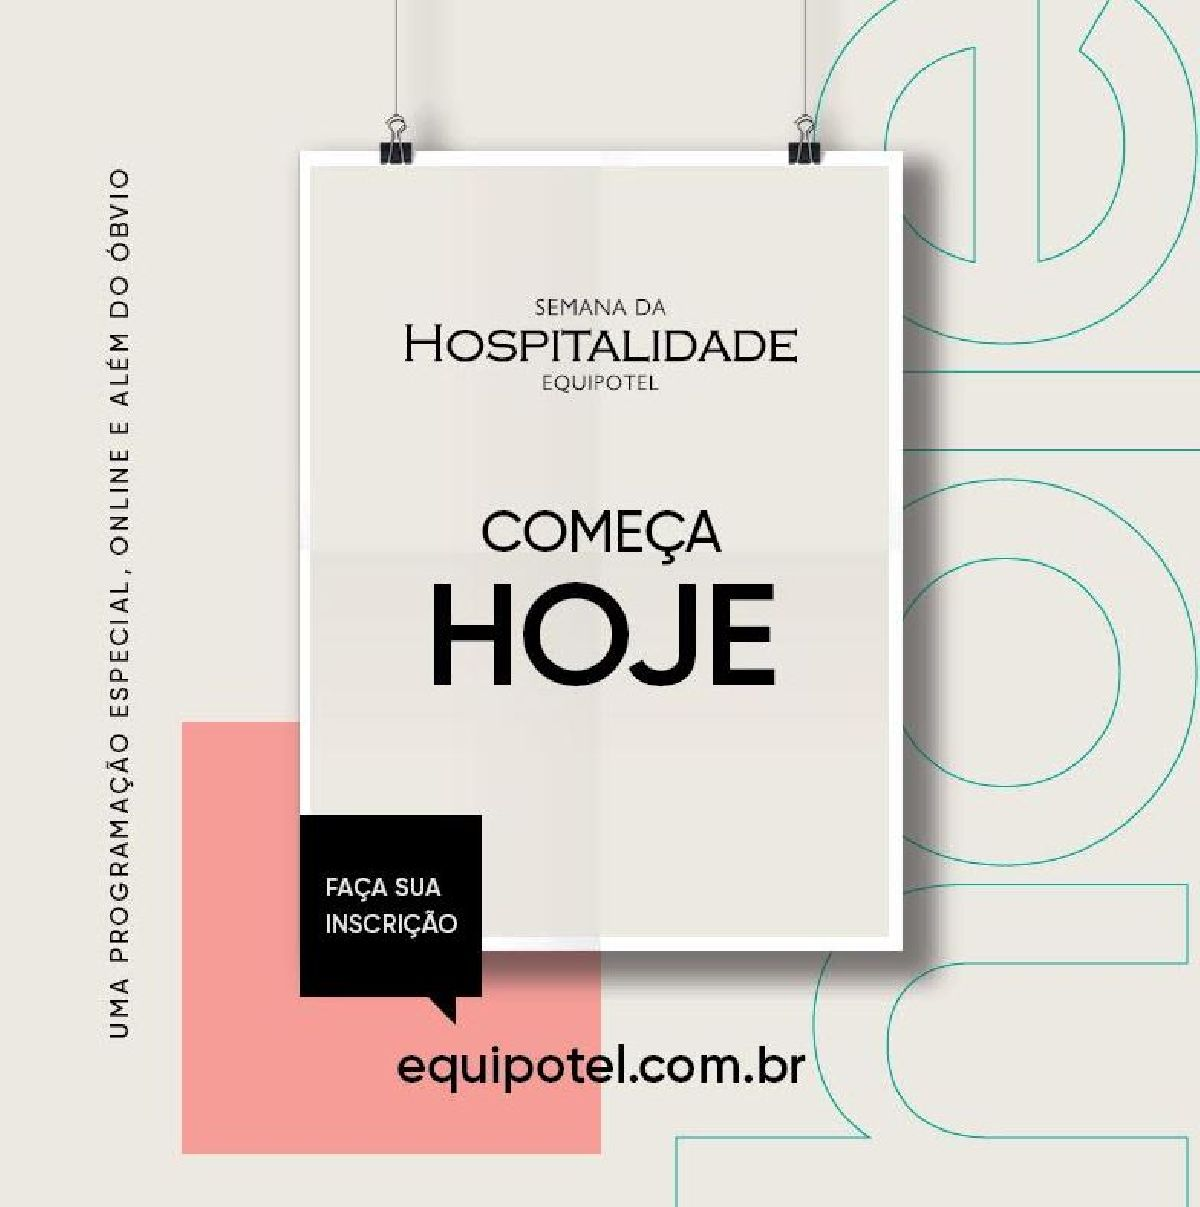 SEMANA DA HOSPITALIDADE EQUIPOTEL – 27 A 30 DE OUTUBRO DE 2020